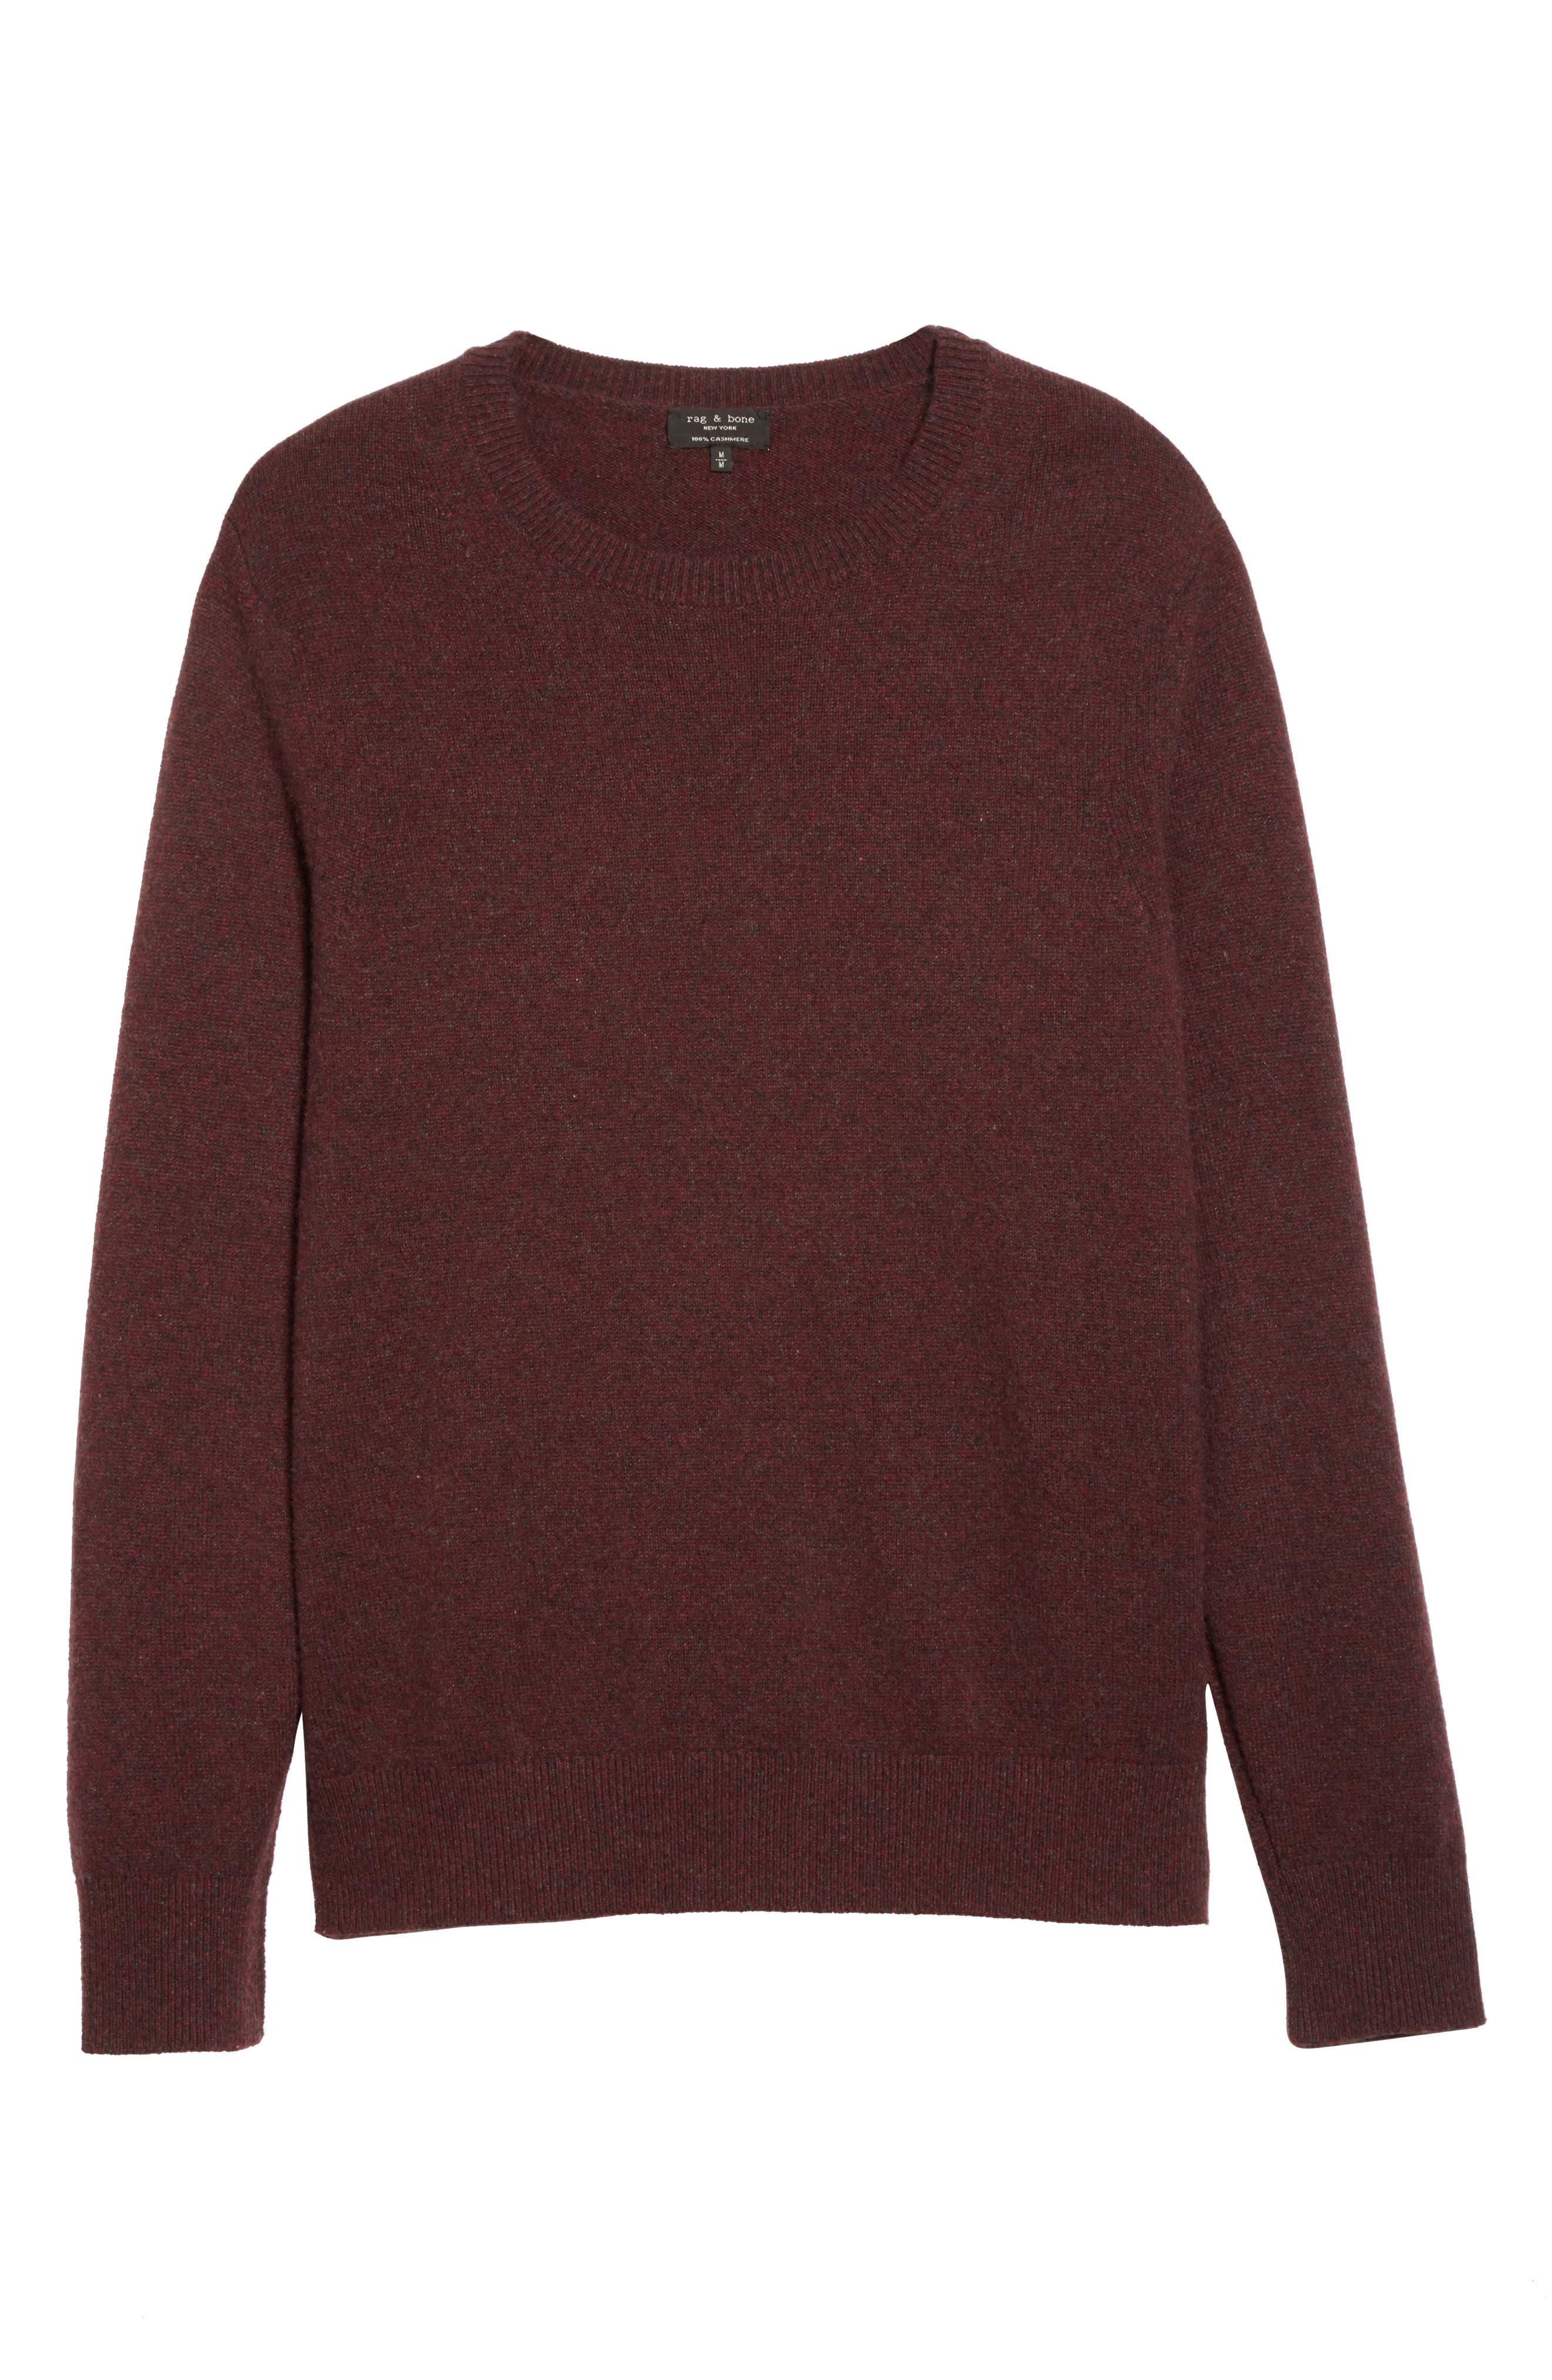 Holdon Cashmere Sweater,                             Alternate thumbnail 6, color,                             Burgundy